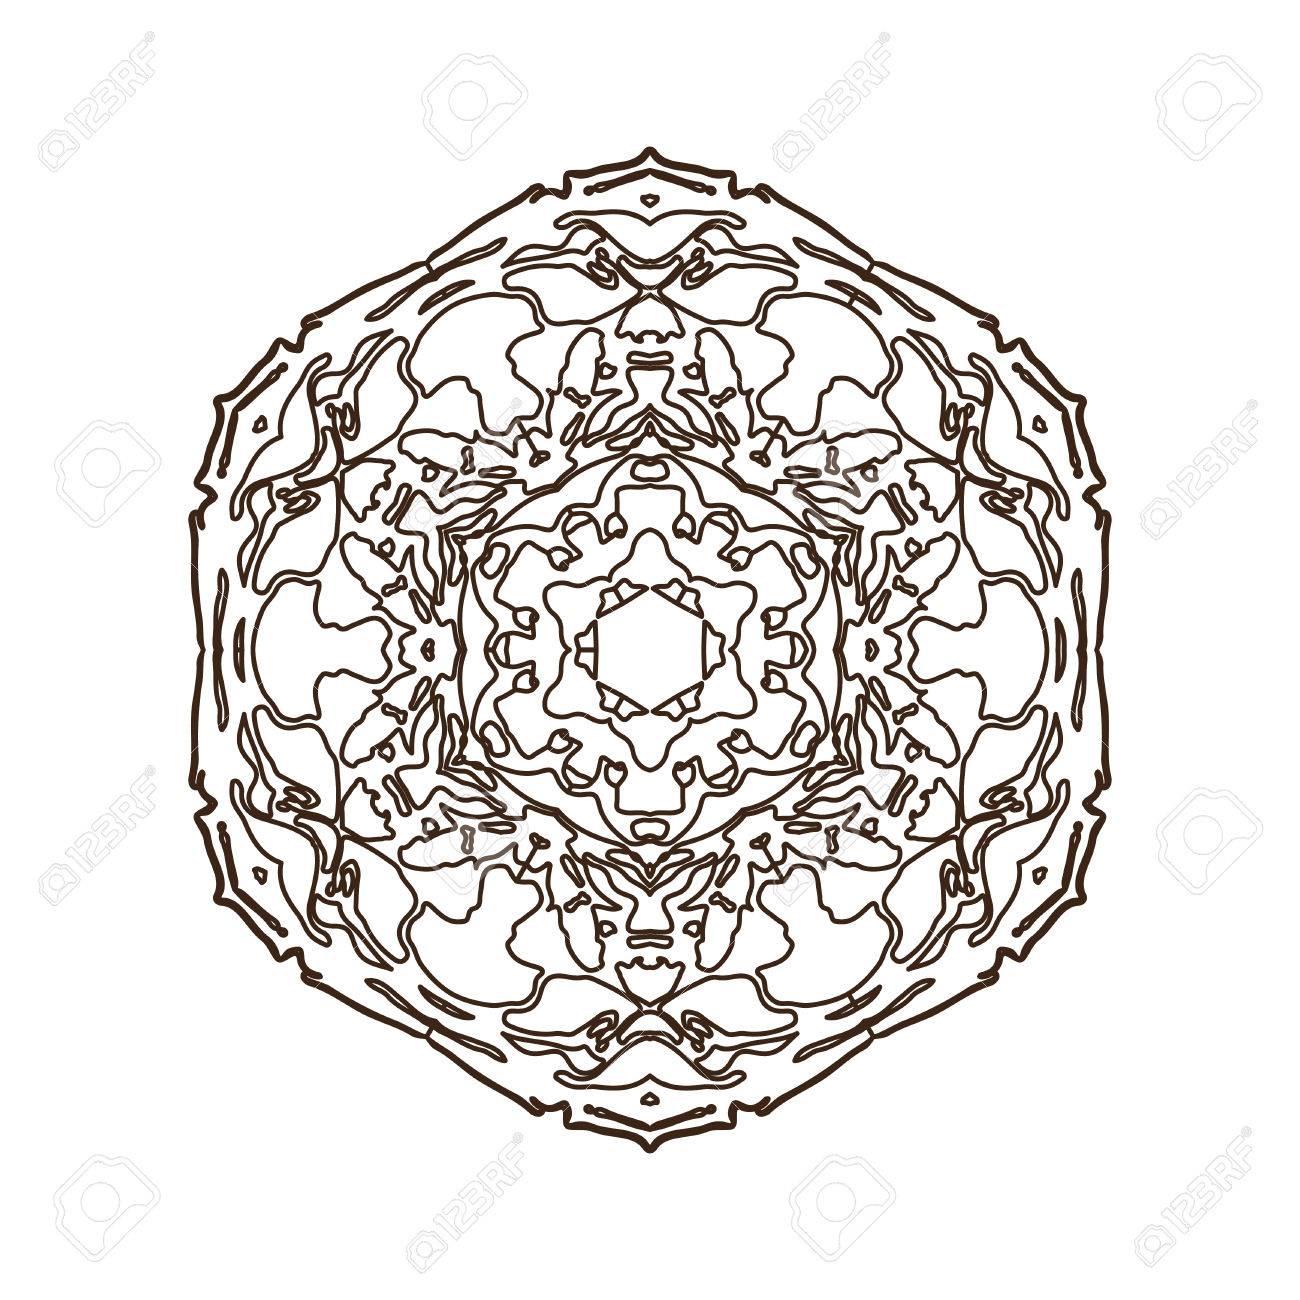 1300x1300 Mandala. Floral Vintage Round Amulet. Indian, Arabic, Buddhist